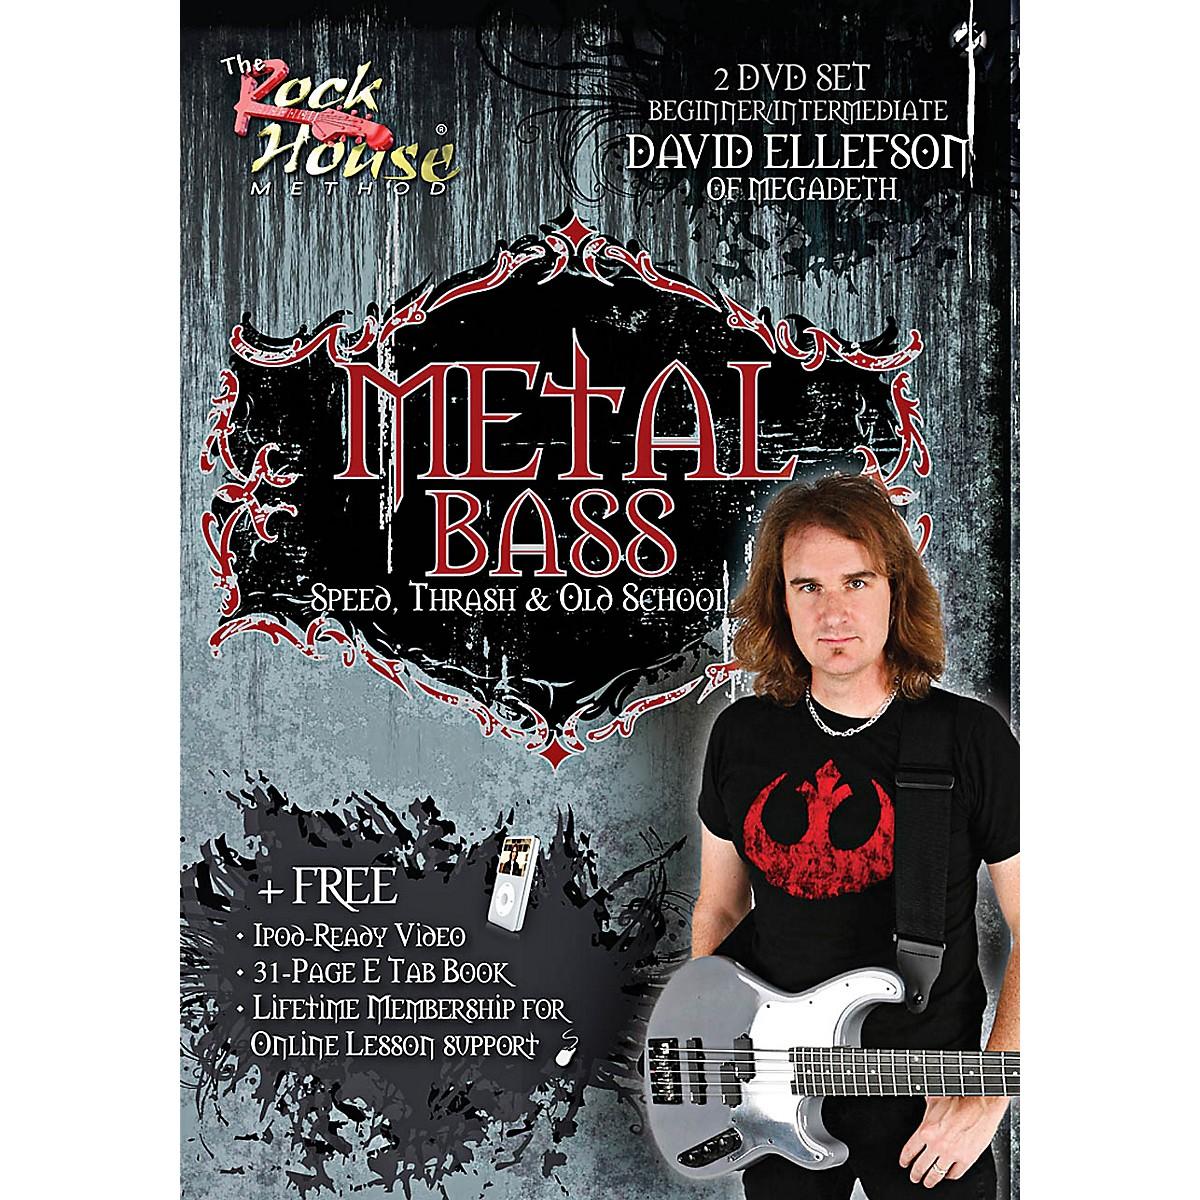 Rock House David Ellefson of Megadeth Metal Bass Speed, Thrash & Old School DVD